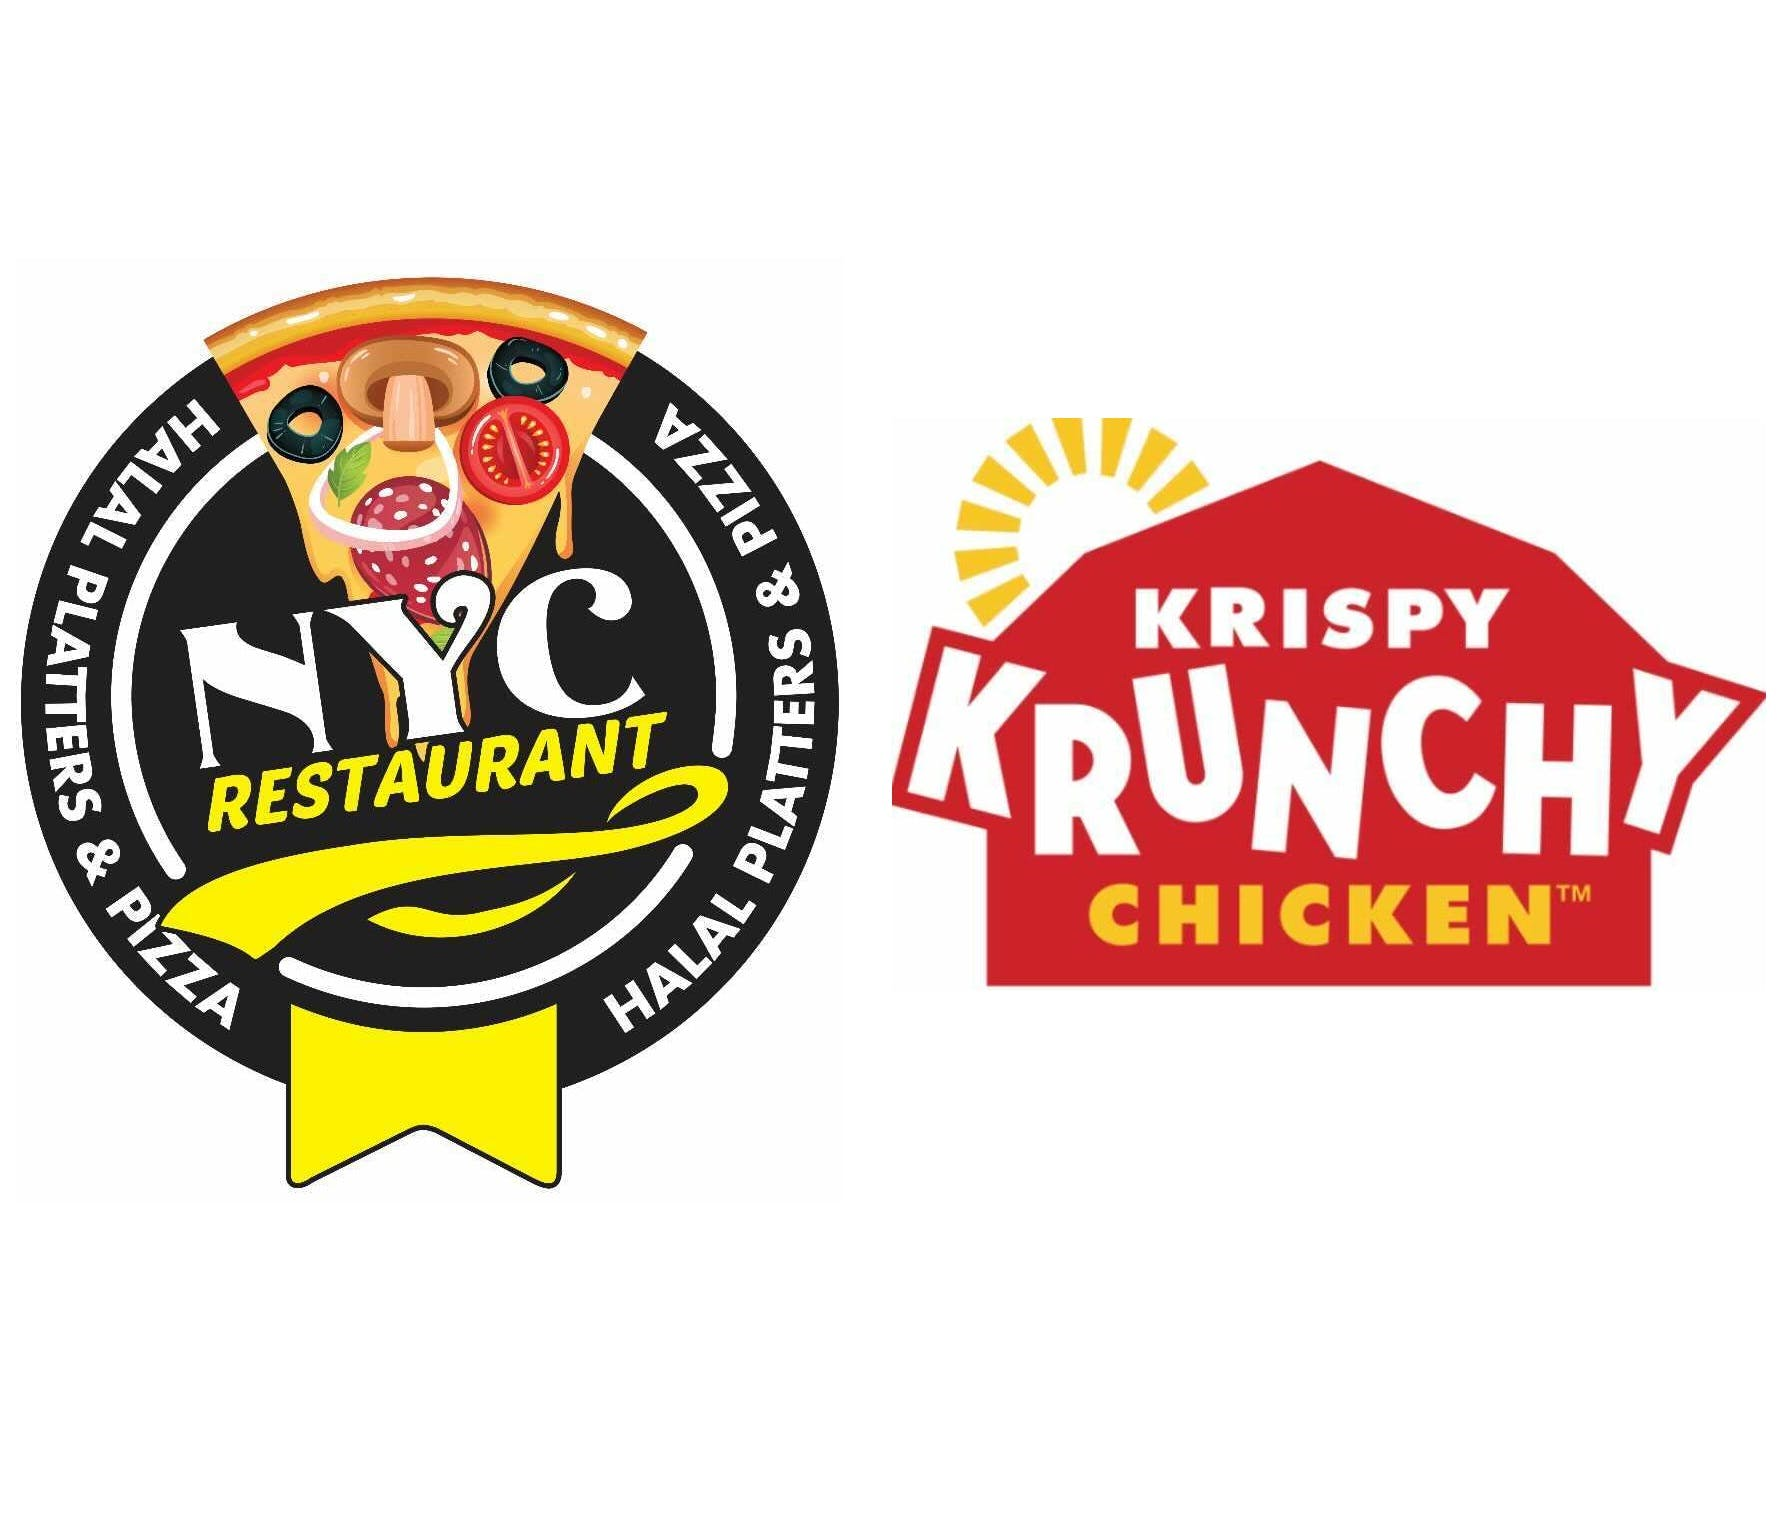 KKC & NYC Restaurant Halal Platters & Pizza